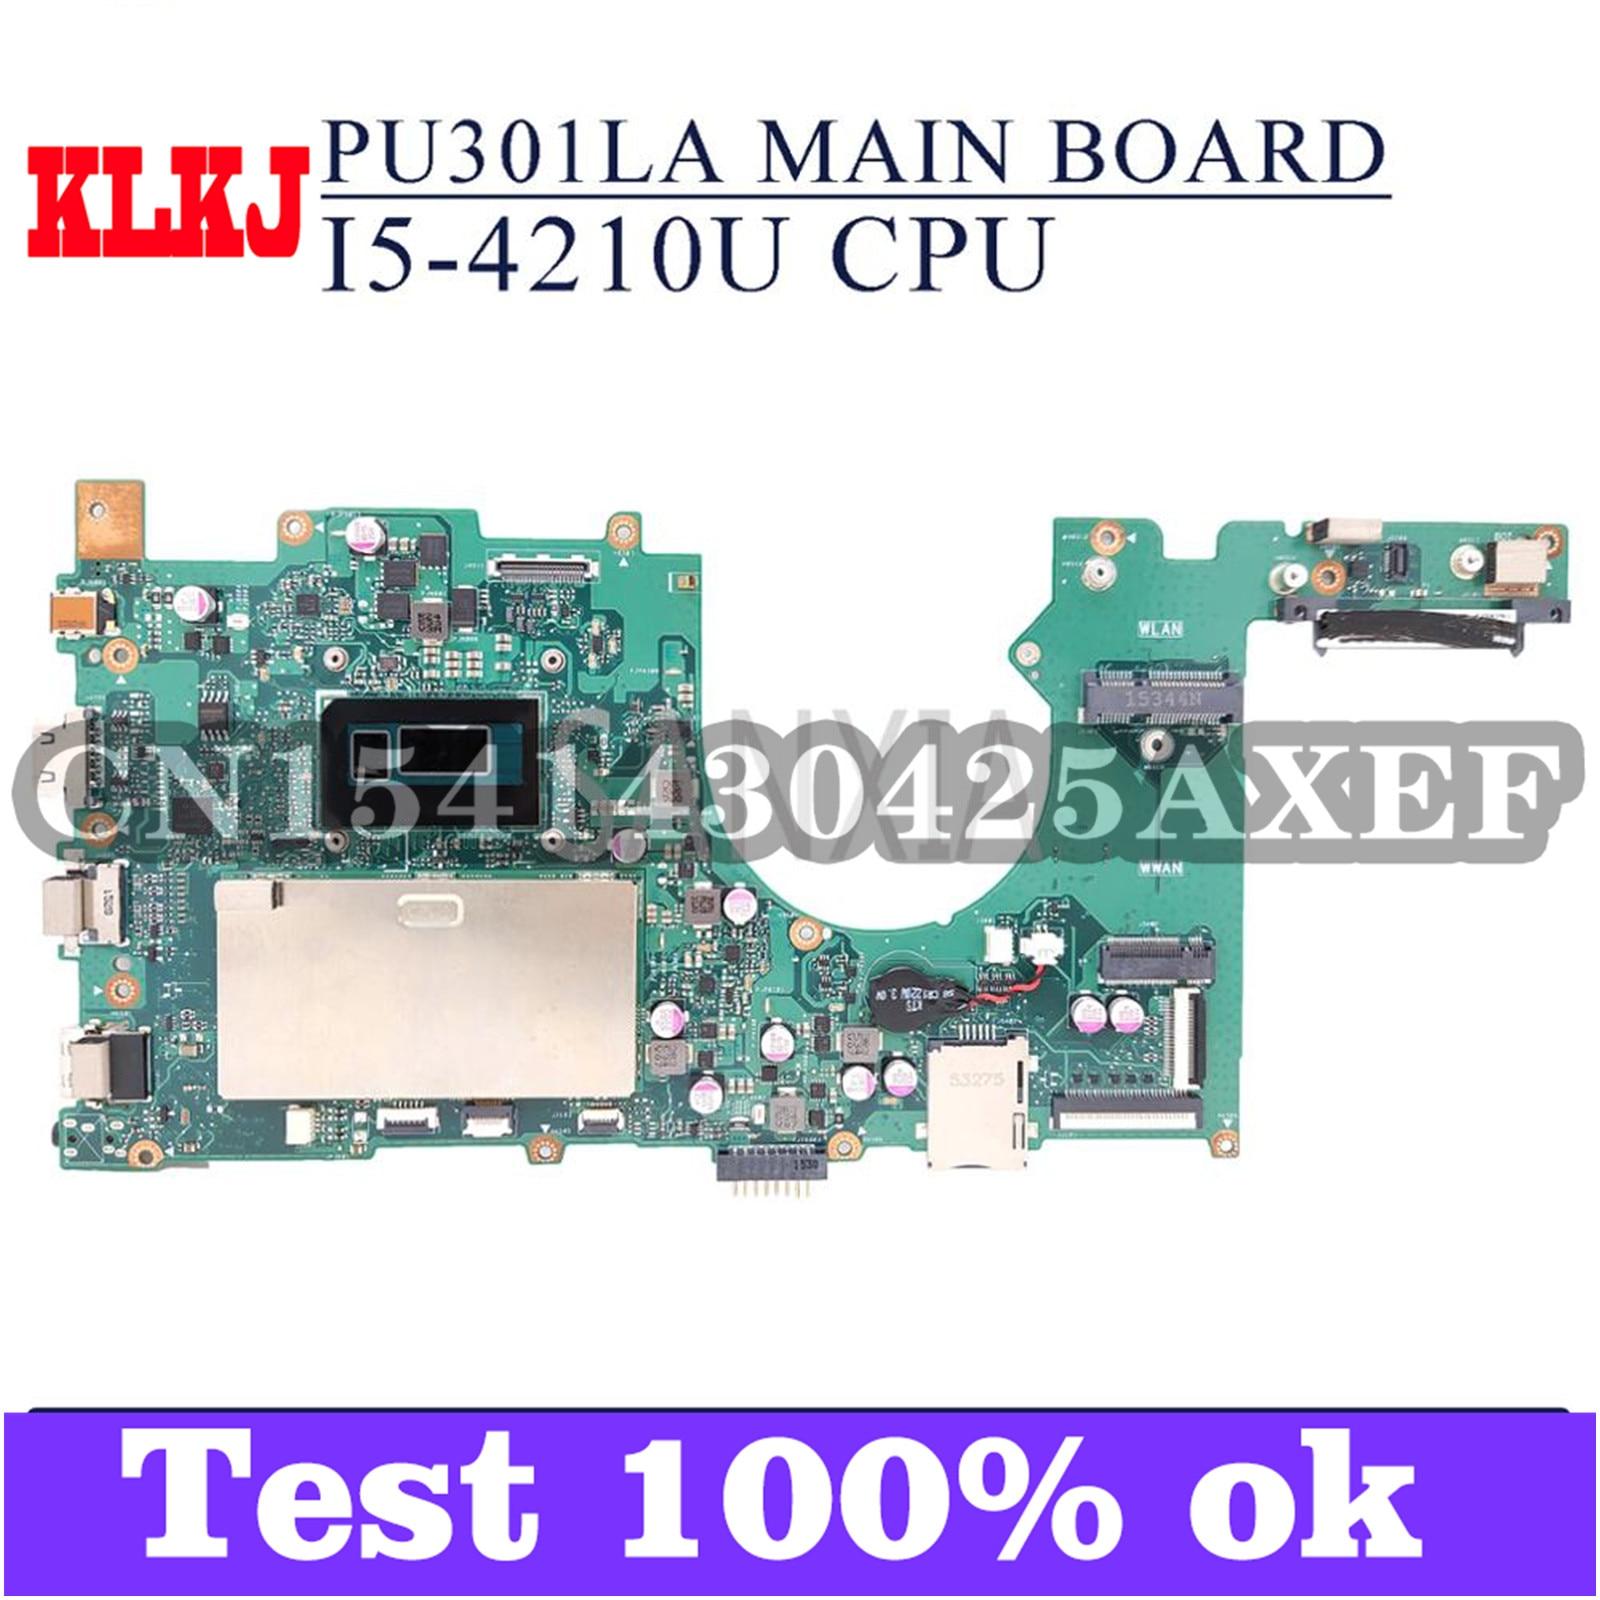 KLKJ PU301LA اللوحة الأم لأجهزة الكمبيوتر المحمول ASUS PU301LA PU301L اللوحة الرئيسية الأصلية I5-4210U